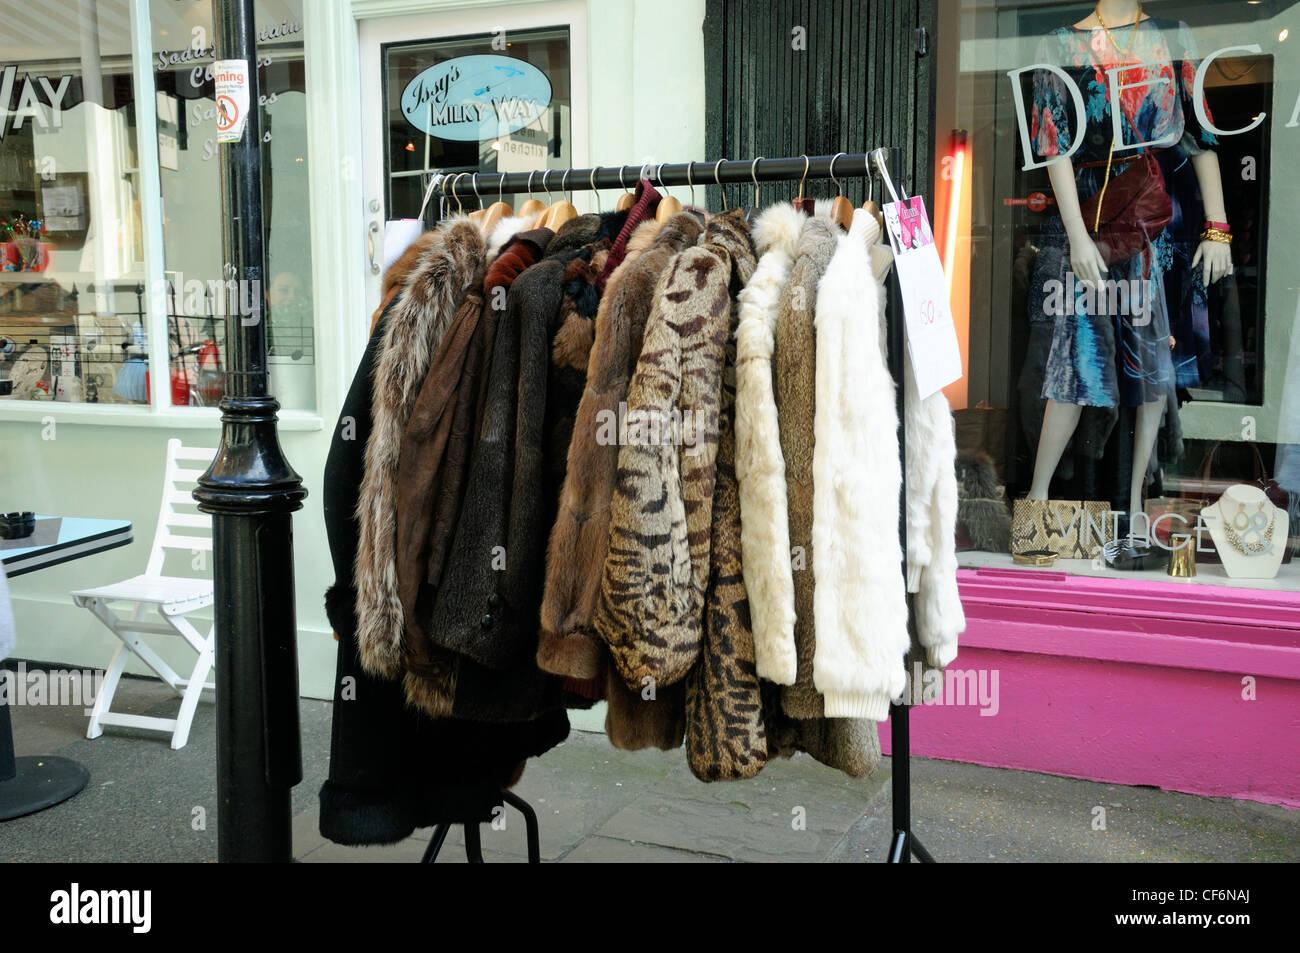 Vintage fur coats for sale on clothes rack outside shop in Camden Passage Islington London England UK - Stock Image